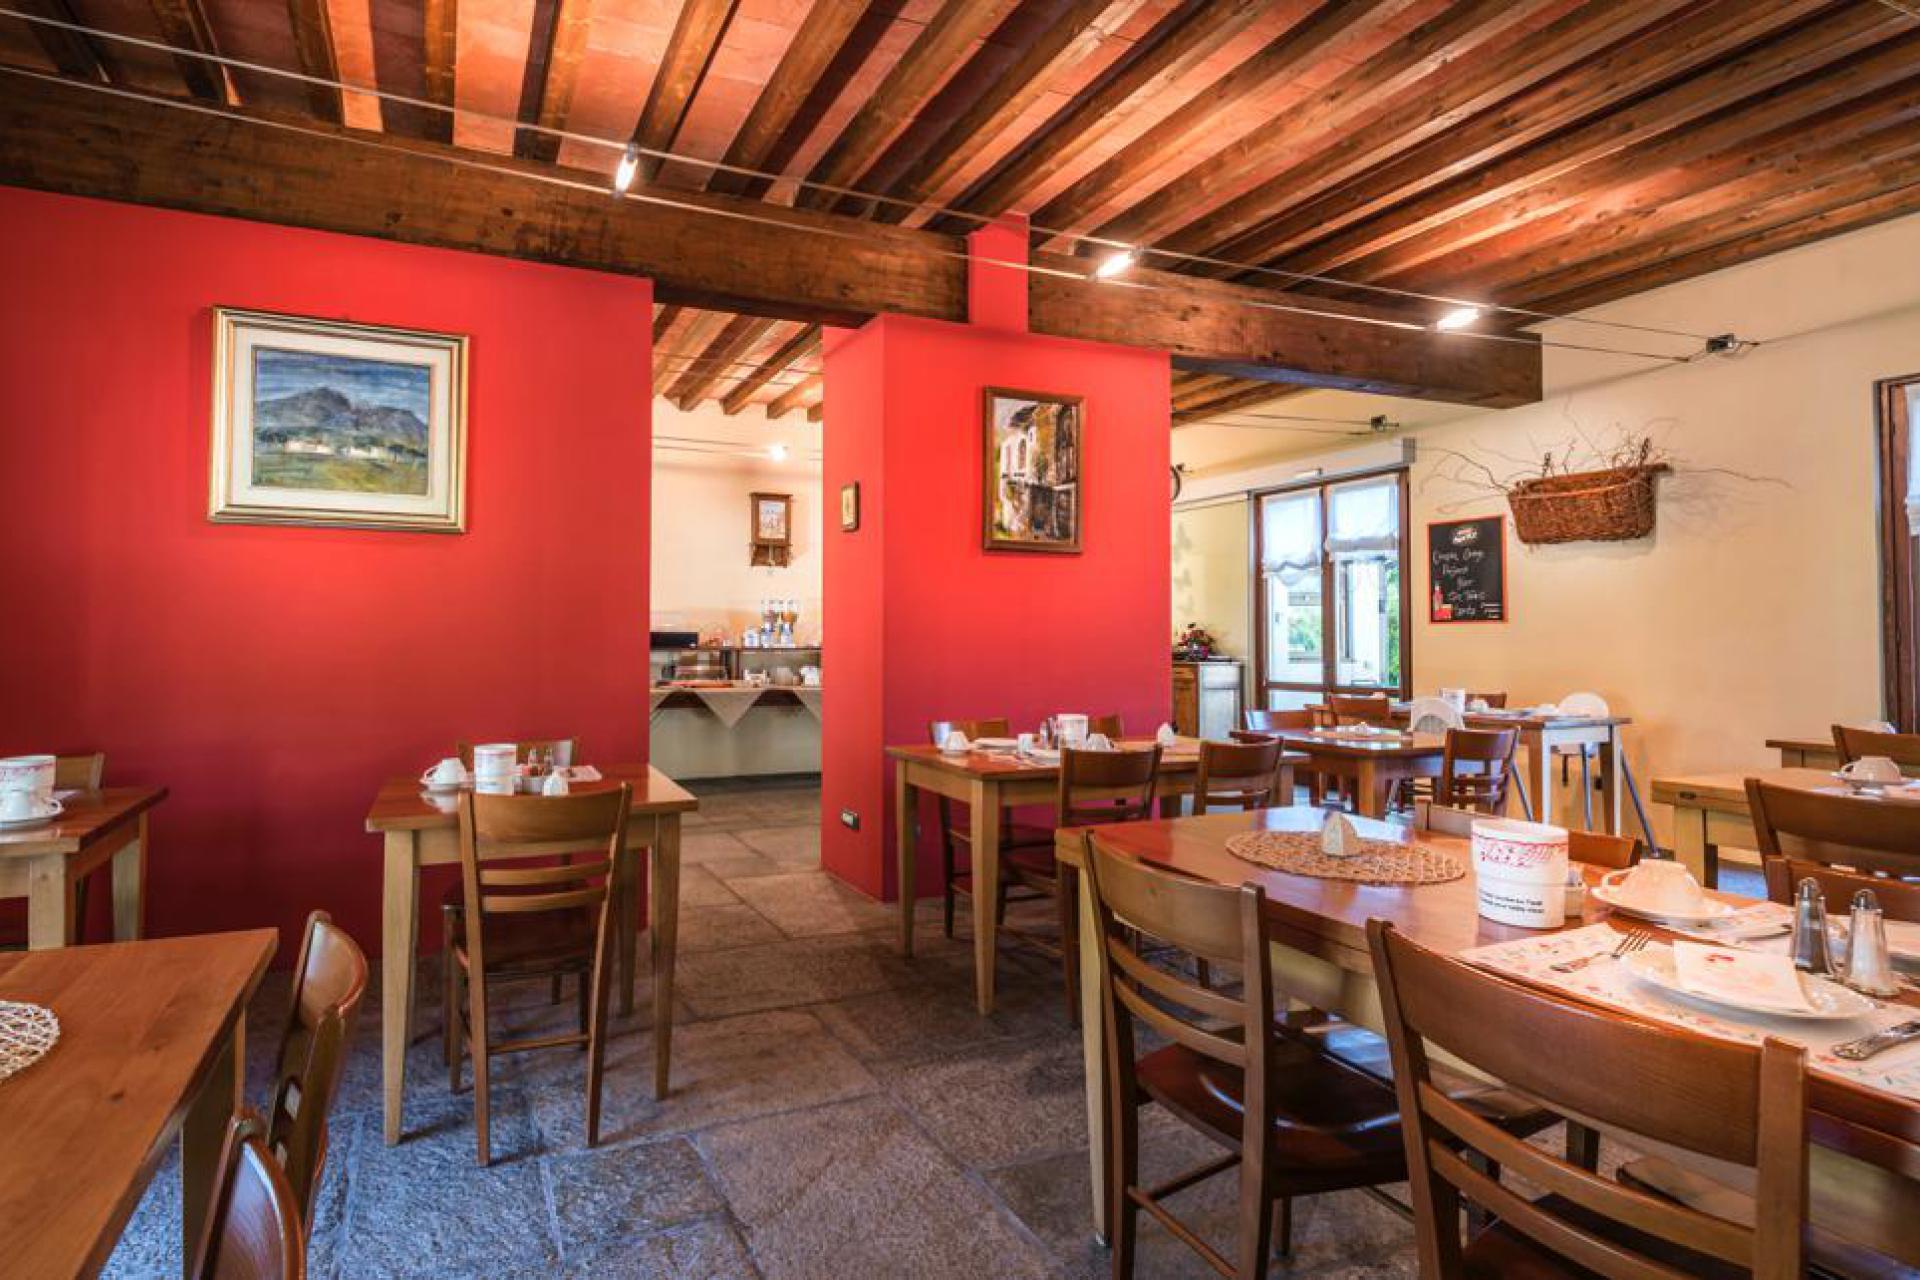 Agriturismo Lake Como and Lake Garda Charming agriturismo at walking distance of Lake Como